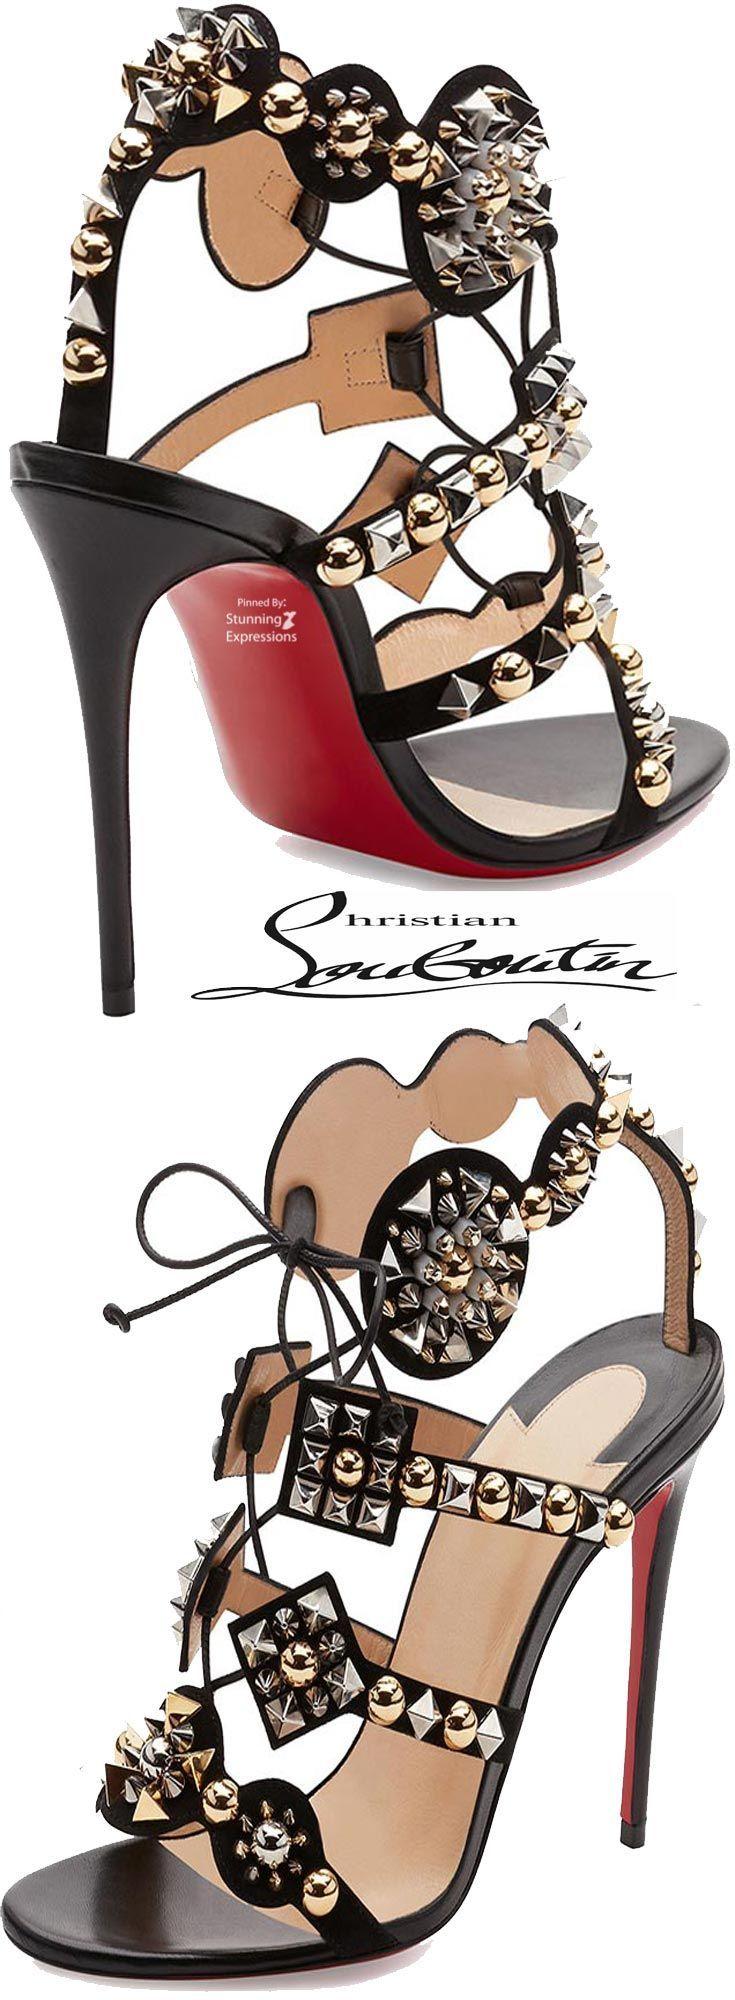 Kaleikita Sandals - Louboutin S/S 2017